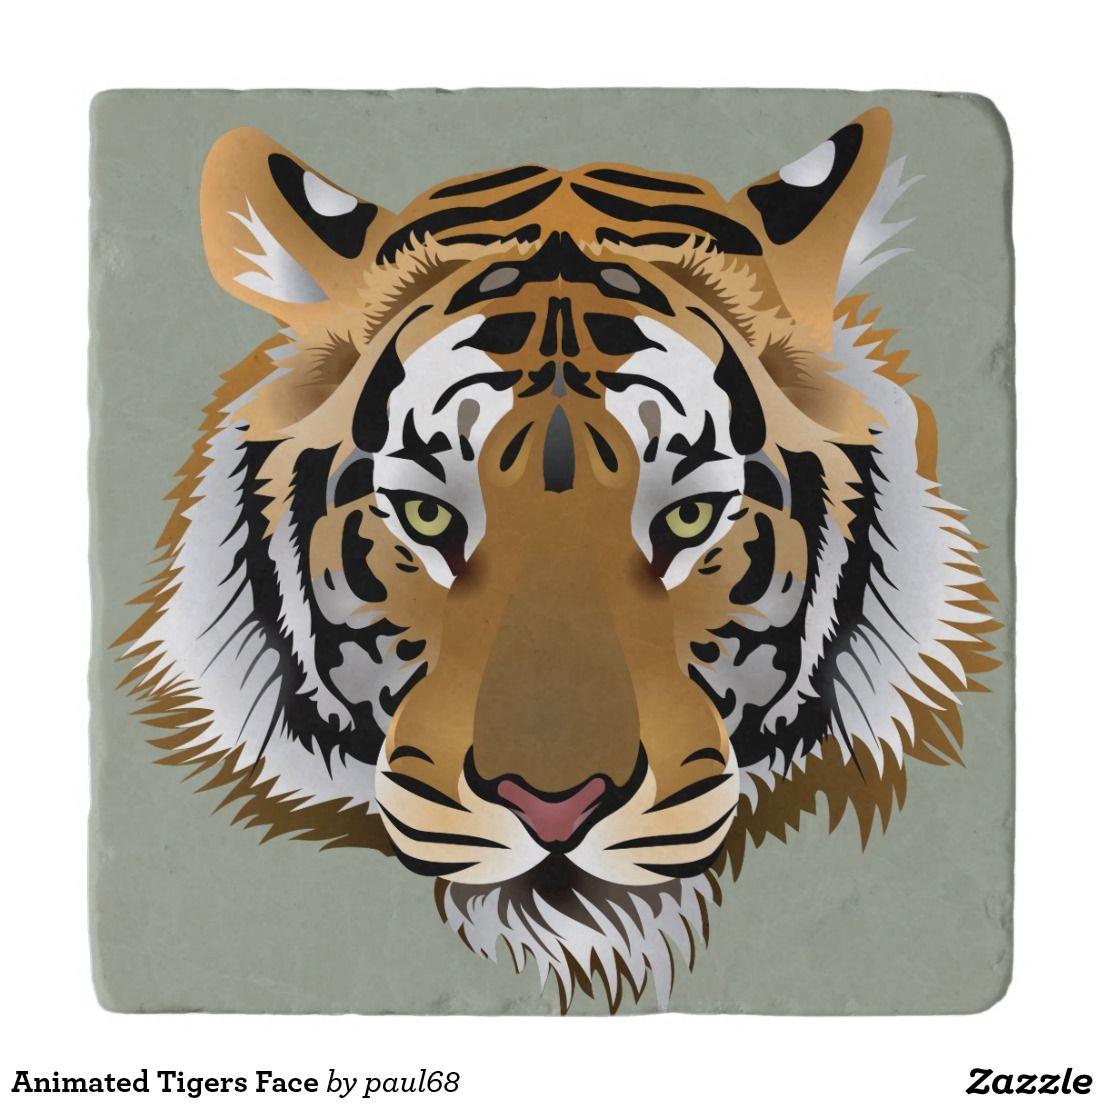 Animated Tigers Face Trivet Zazzle Com In 2021 Tiger Images Tiger Art Tiger Face